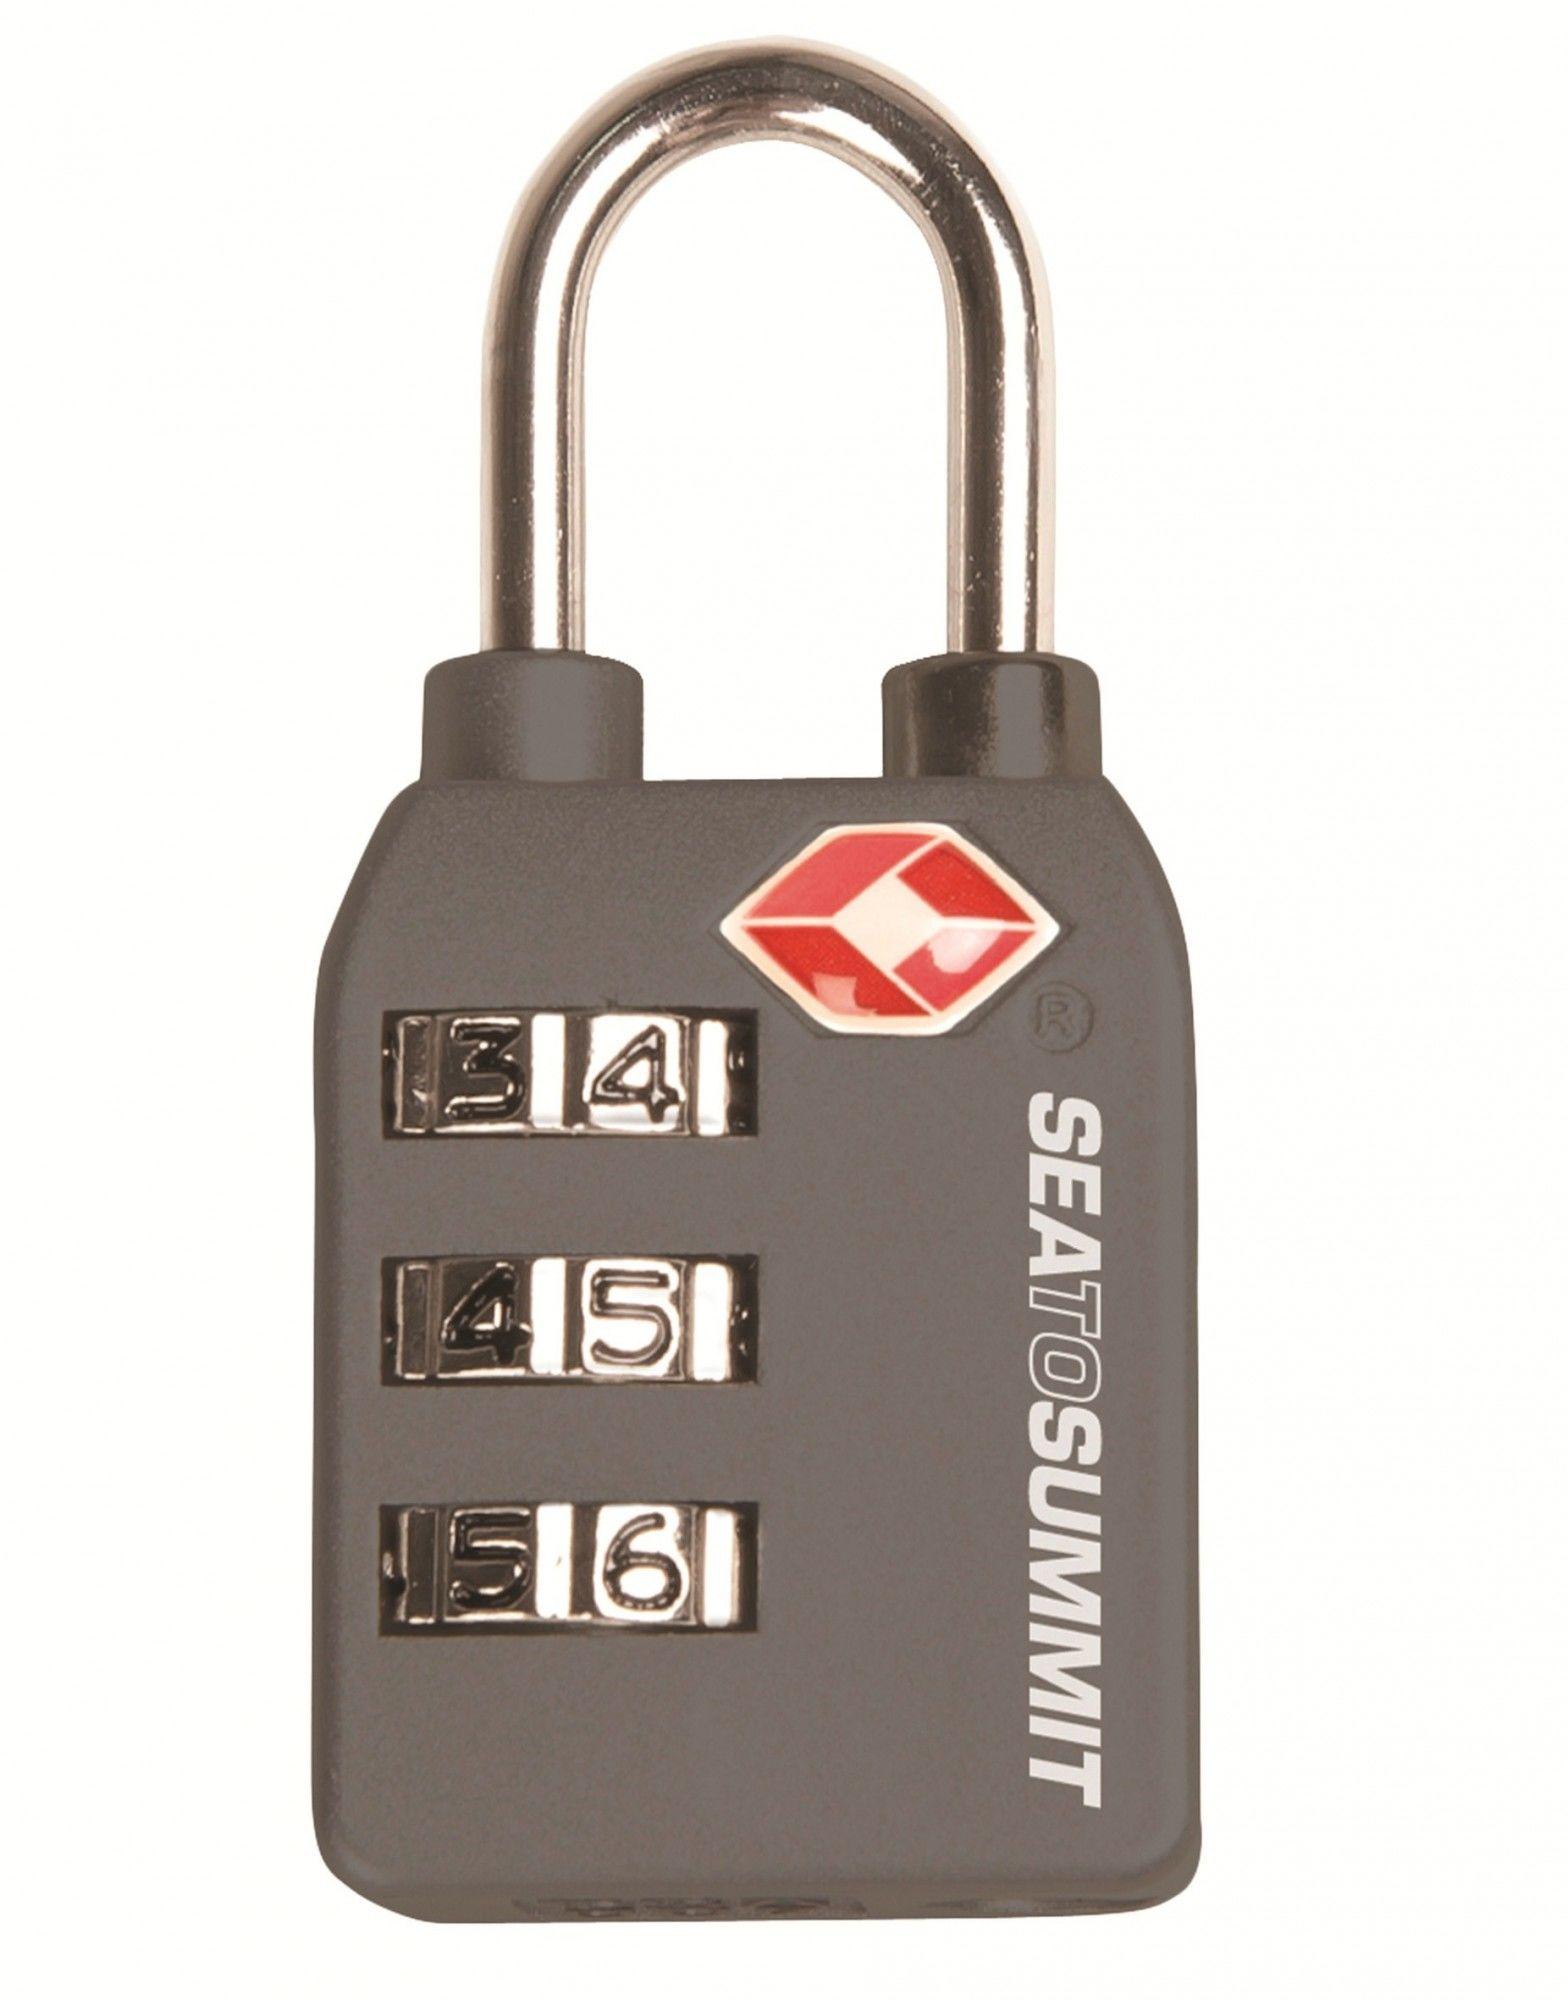 Sea to Summit TSA Travel Lock / Combination | Größe One Size |  Handtücher